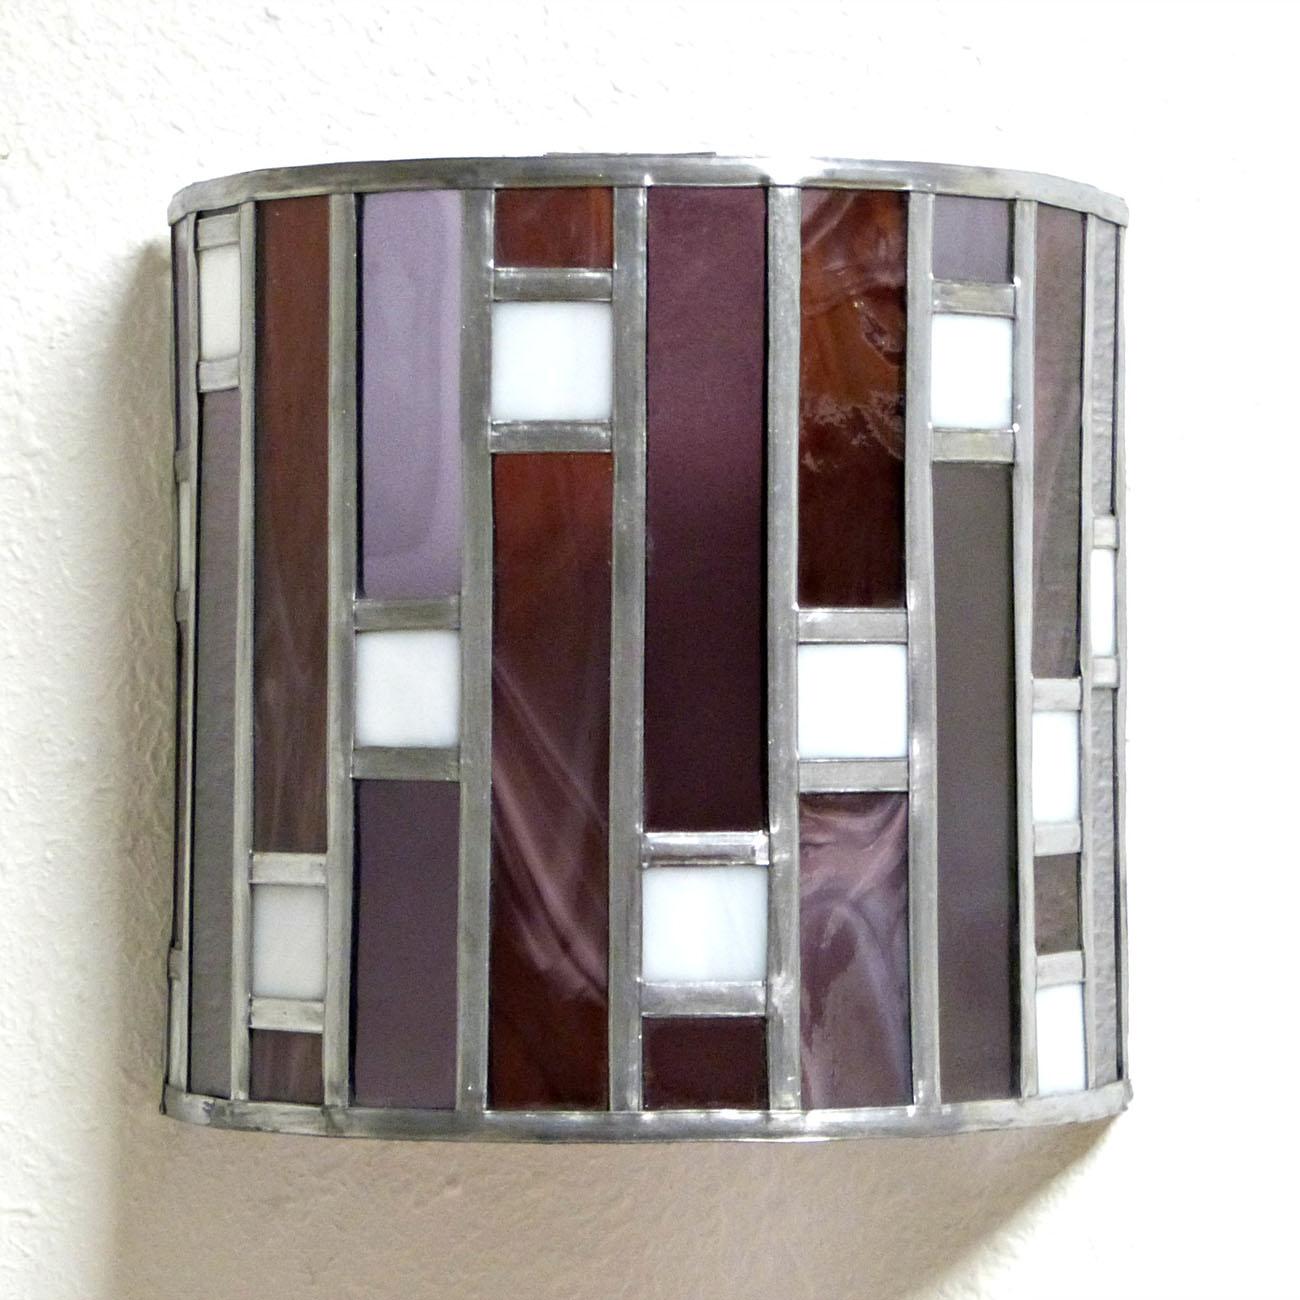 Applique murale vitrail art deco forme demi cylindre rose et violet 2 1